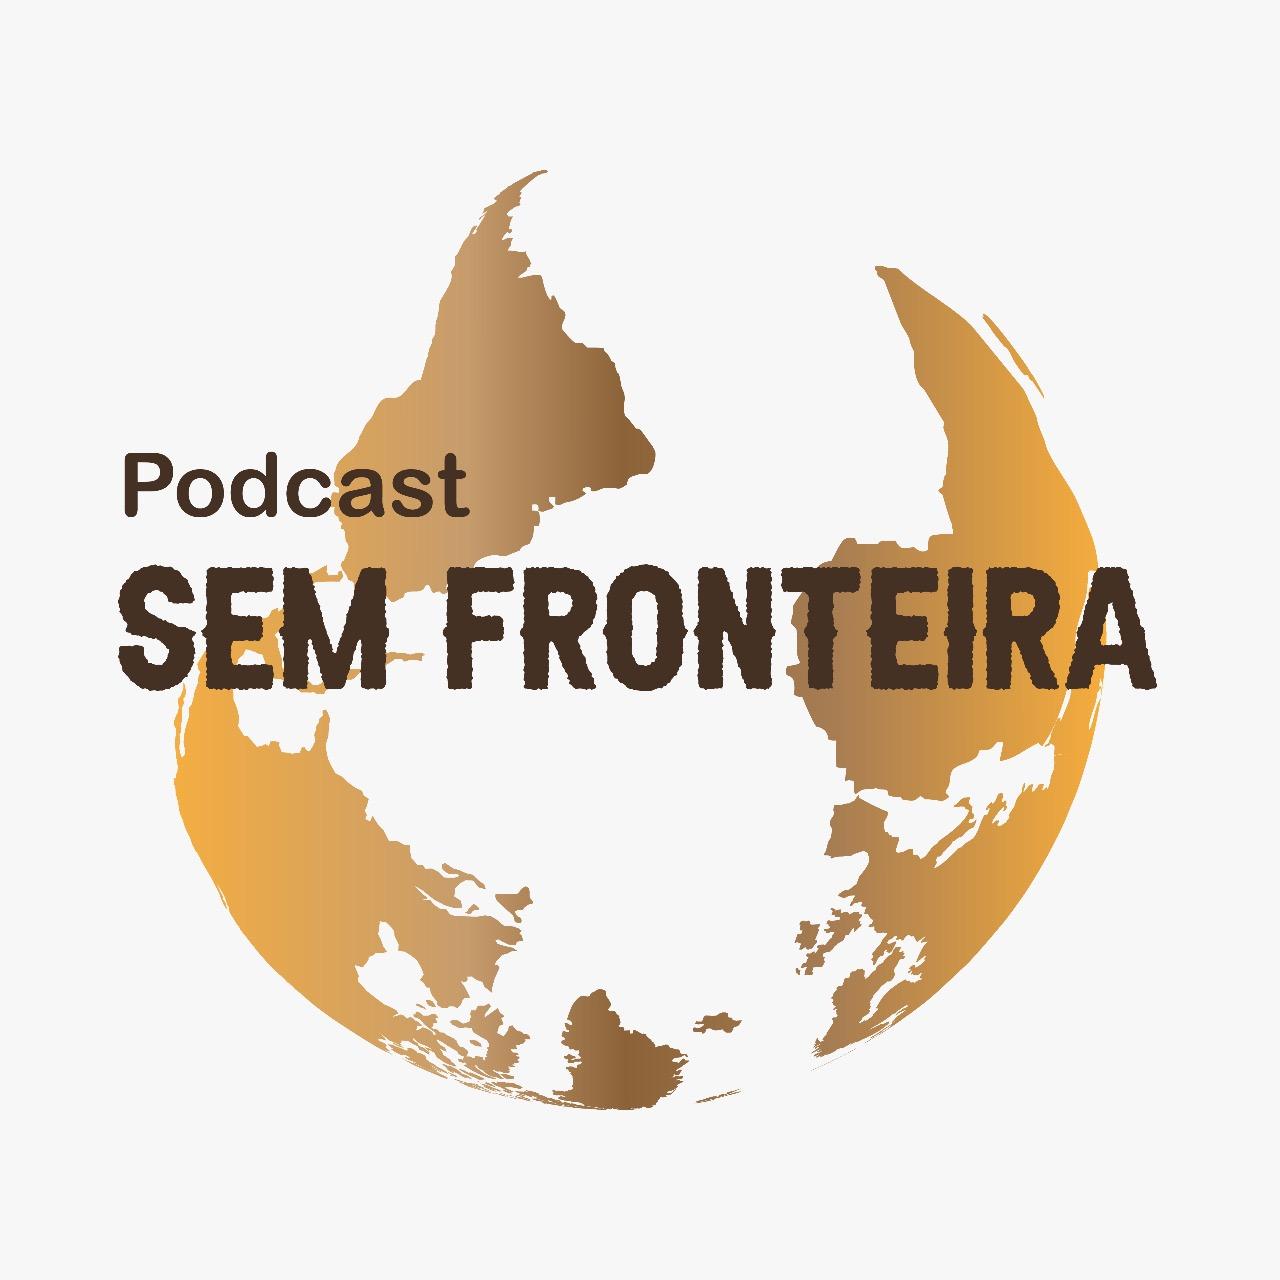 @psemfronteira Profile Image | Linktree